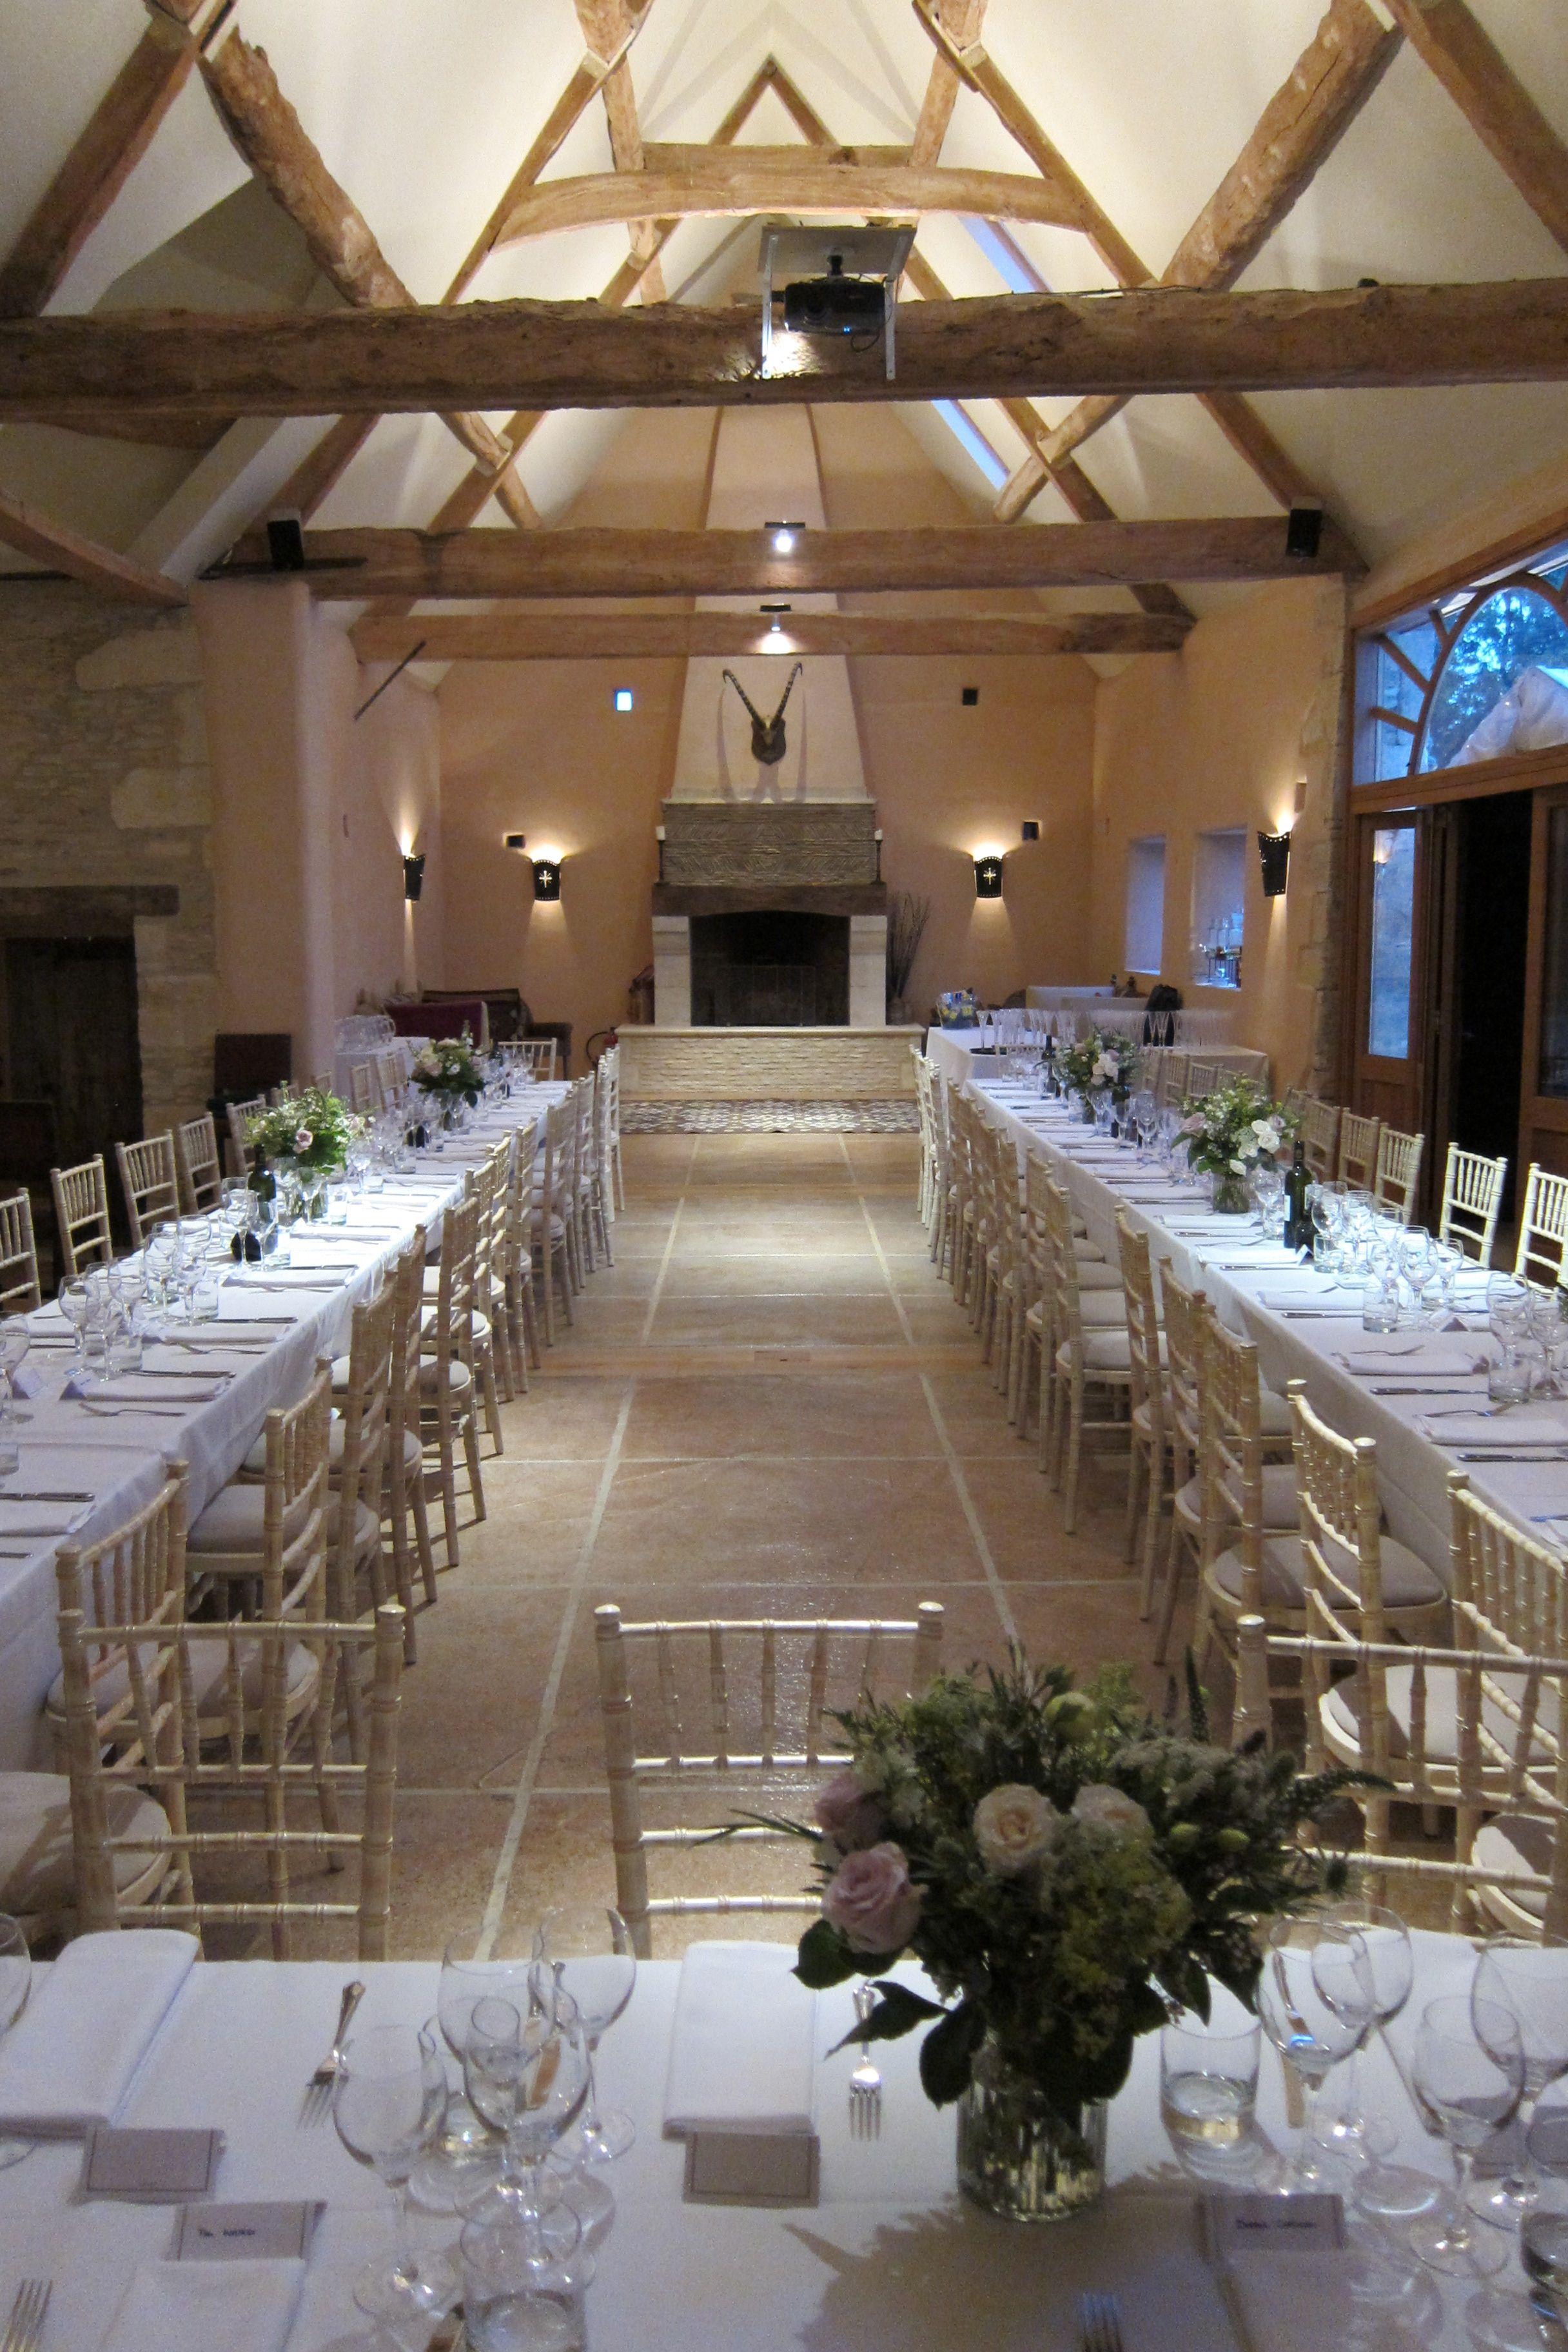 Banquet Tables In A U Shape Oxleaze Barn Barn Wedding Venue